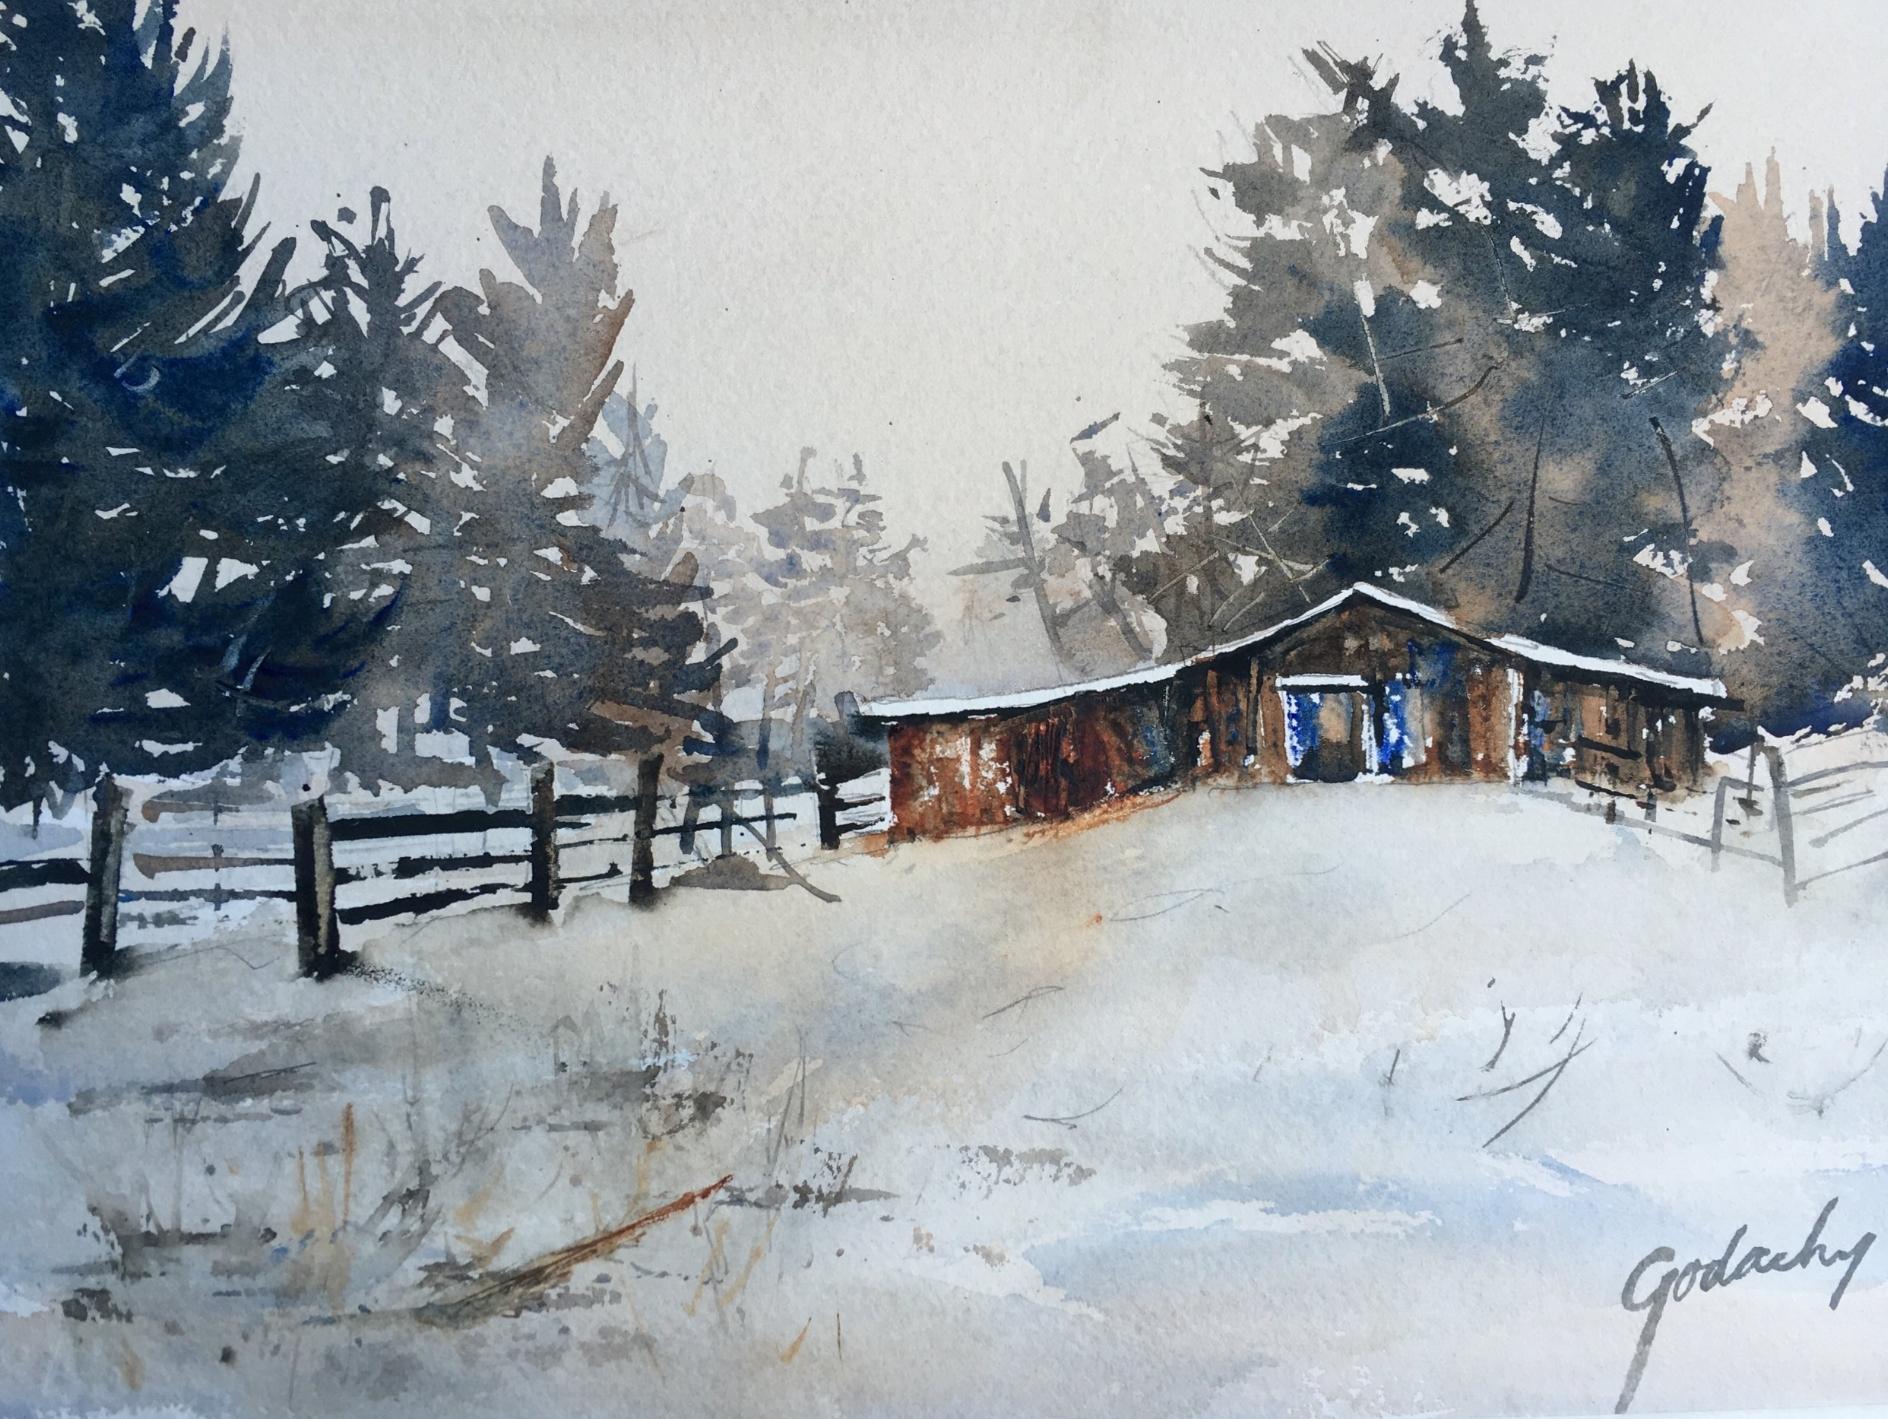 Christy's Farm, Sold